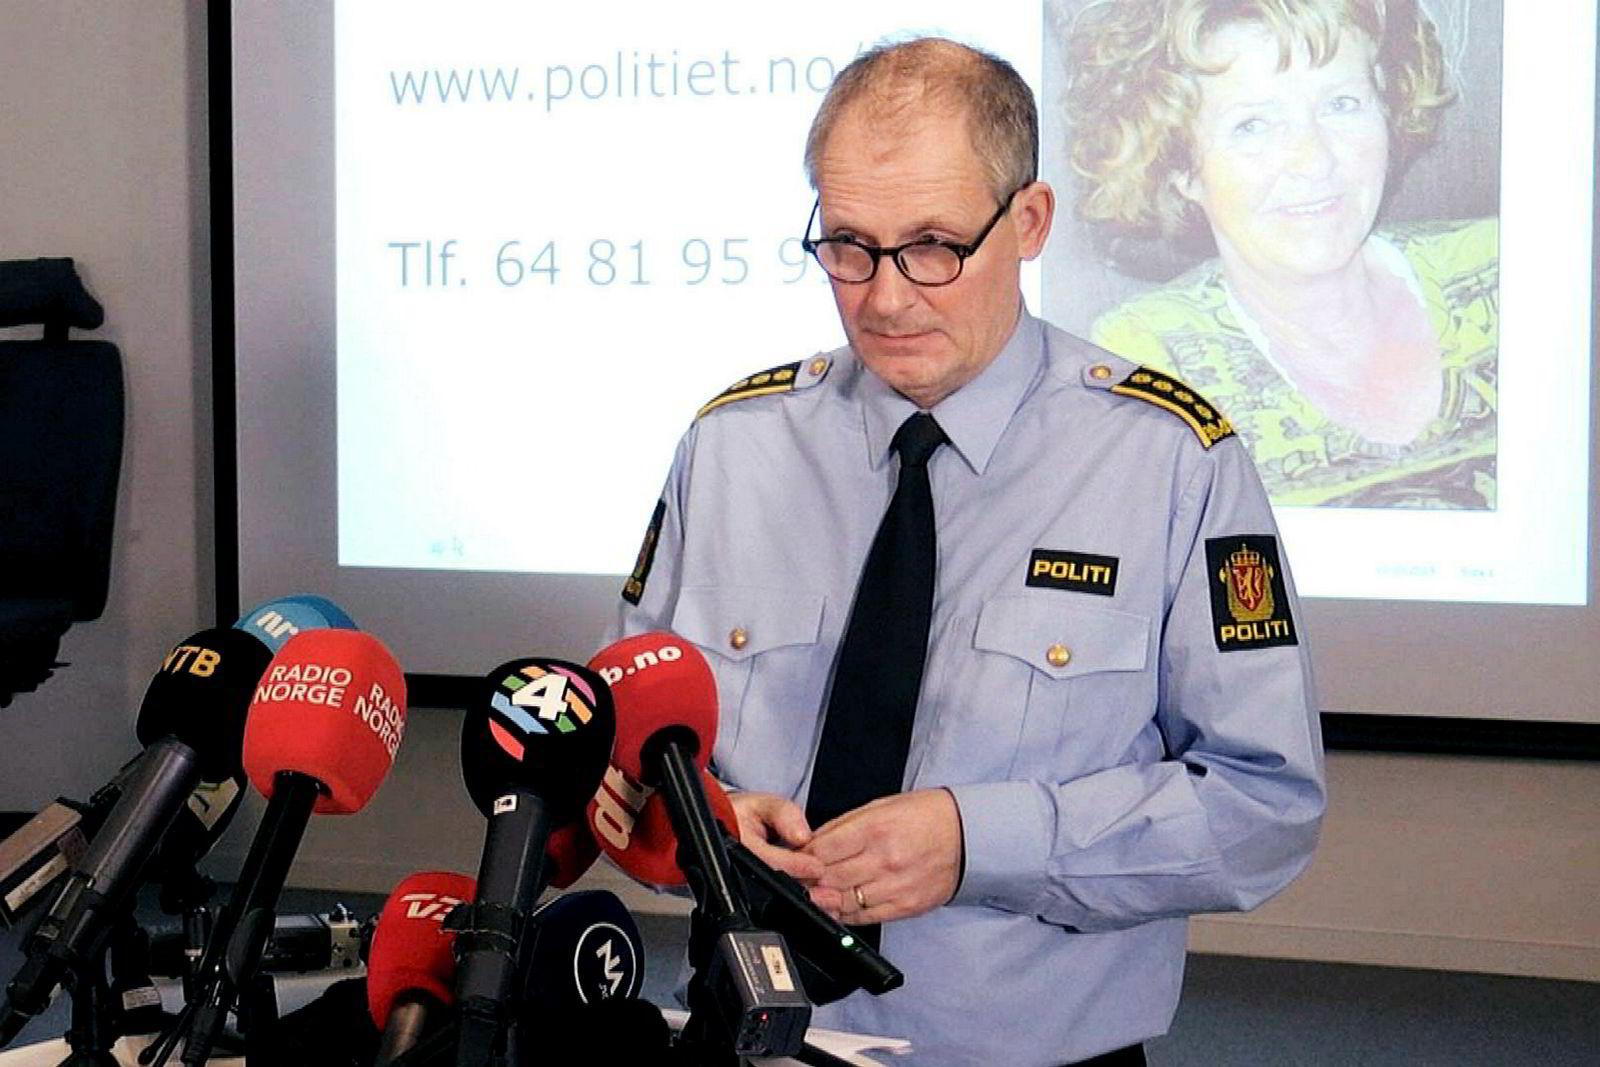 Politiet ble varslet om bortføringen av Anne-Elisabeth Hagen onsdag 31. oktober og anmeldte umiddelbart saken, sa politiinspektør Tommy Brøske i Øst politidistrikt under en pressekonferanse torsdag.